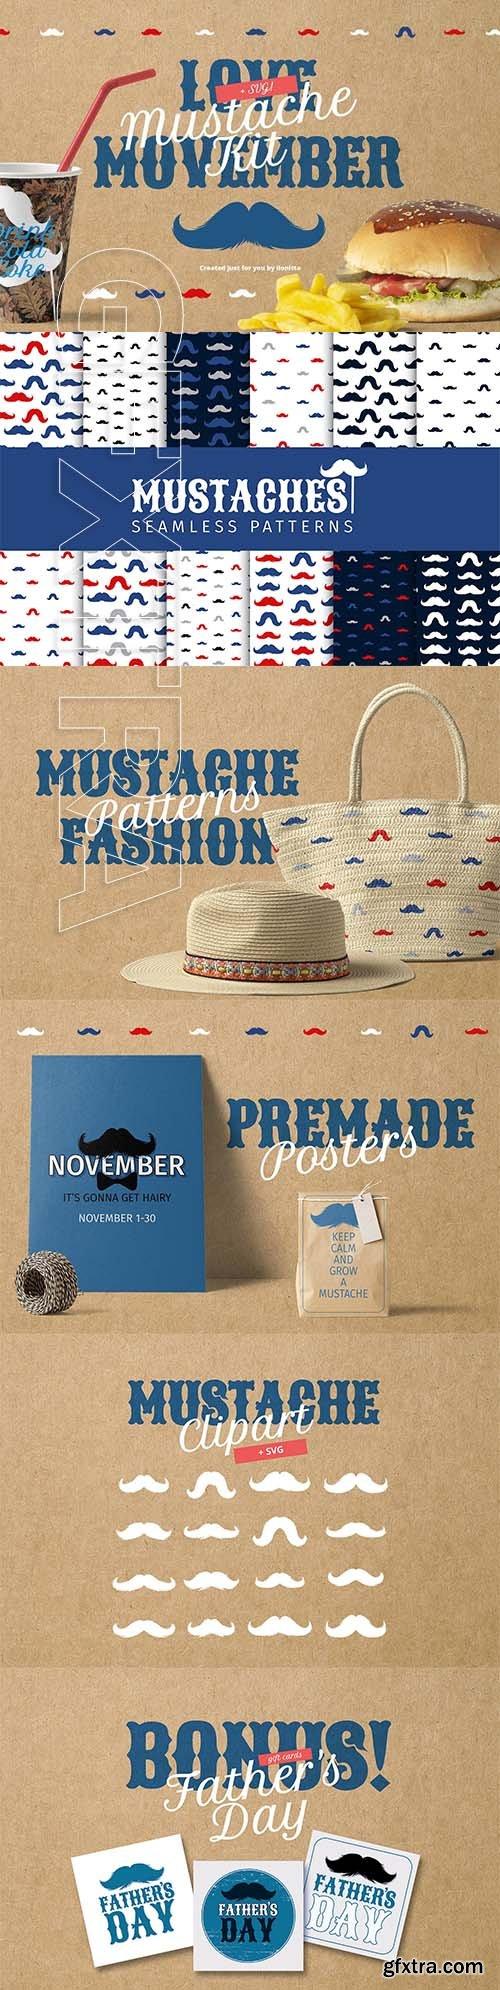 CreativeMarket - Movember Style Mustache Kit 2857949